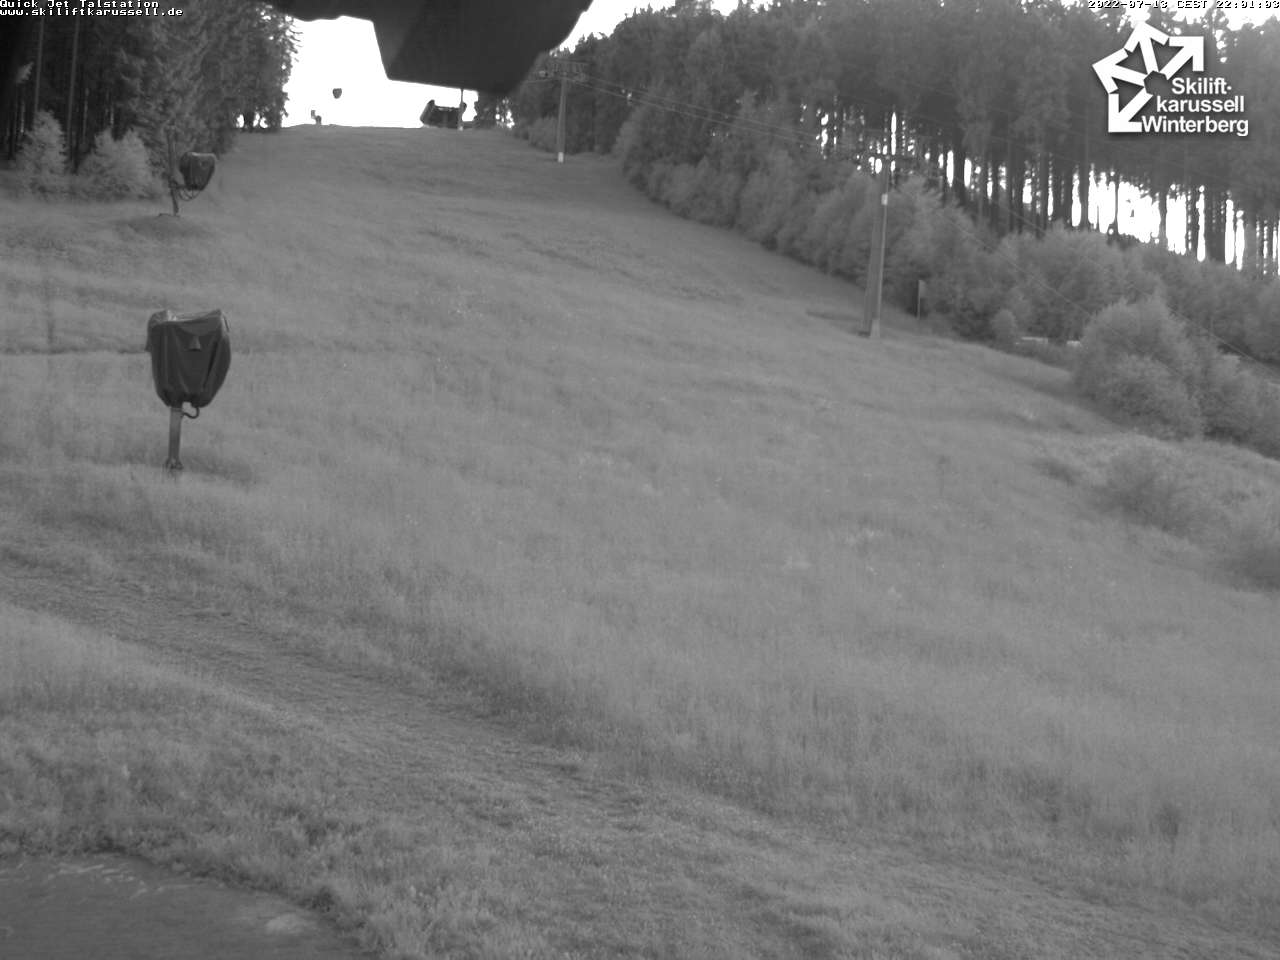 Skilift Quick Jet, Winterberg